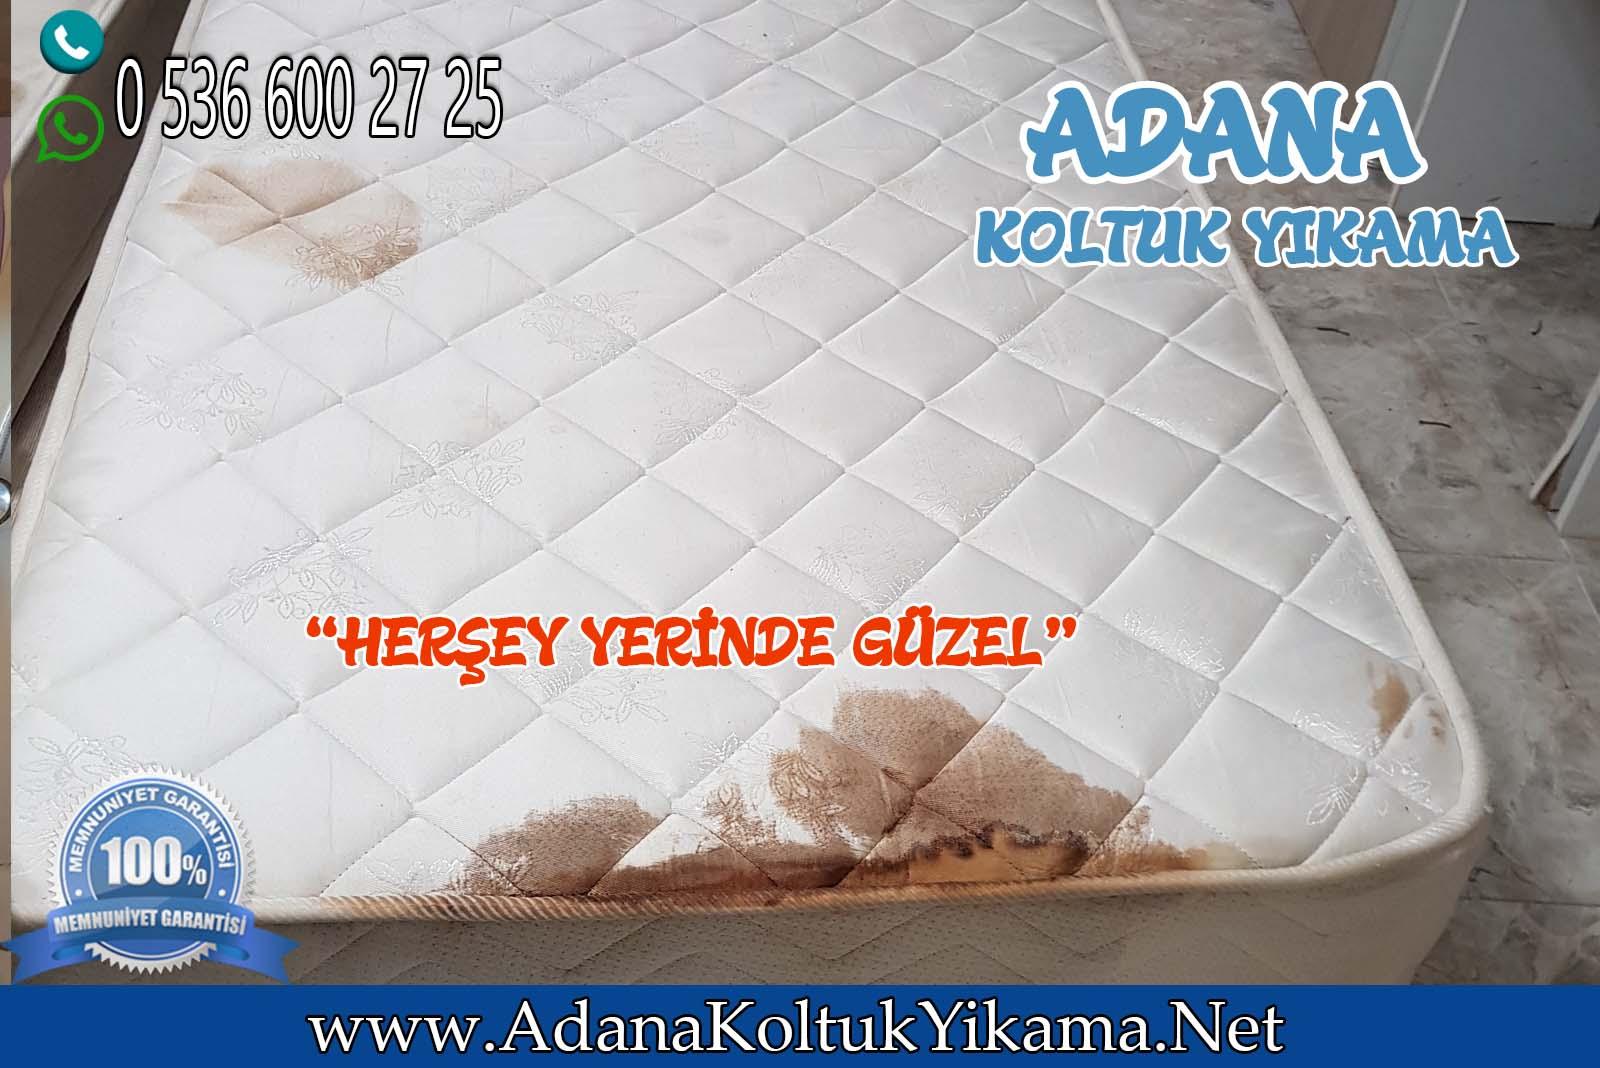 Adana Koltuk Yıkama + Anka Kız Yurdu + Yatak Yıkama